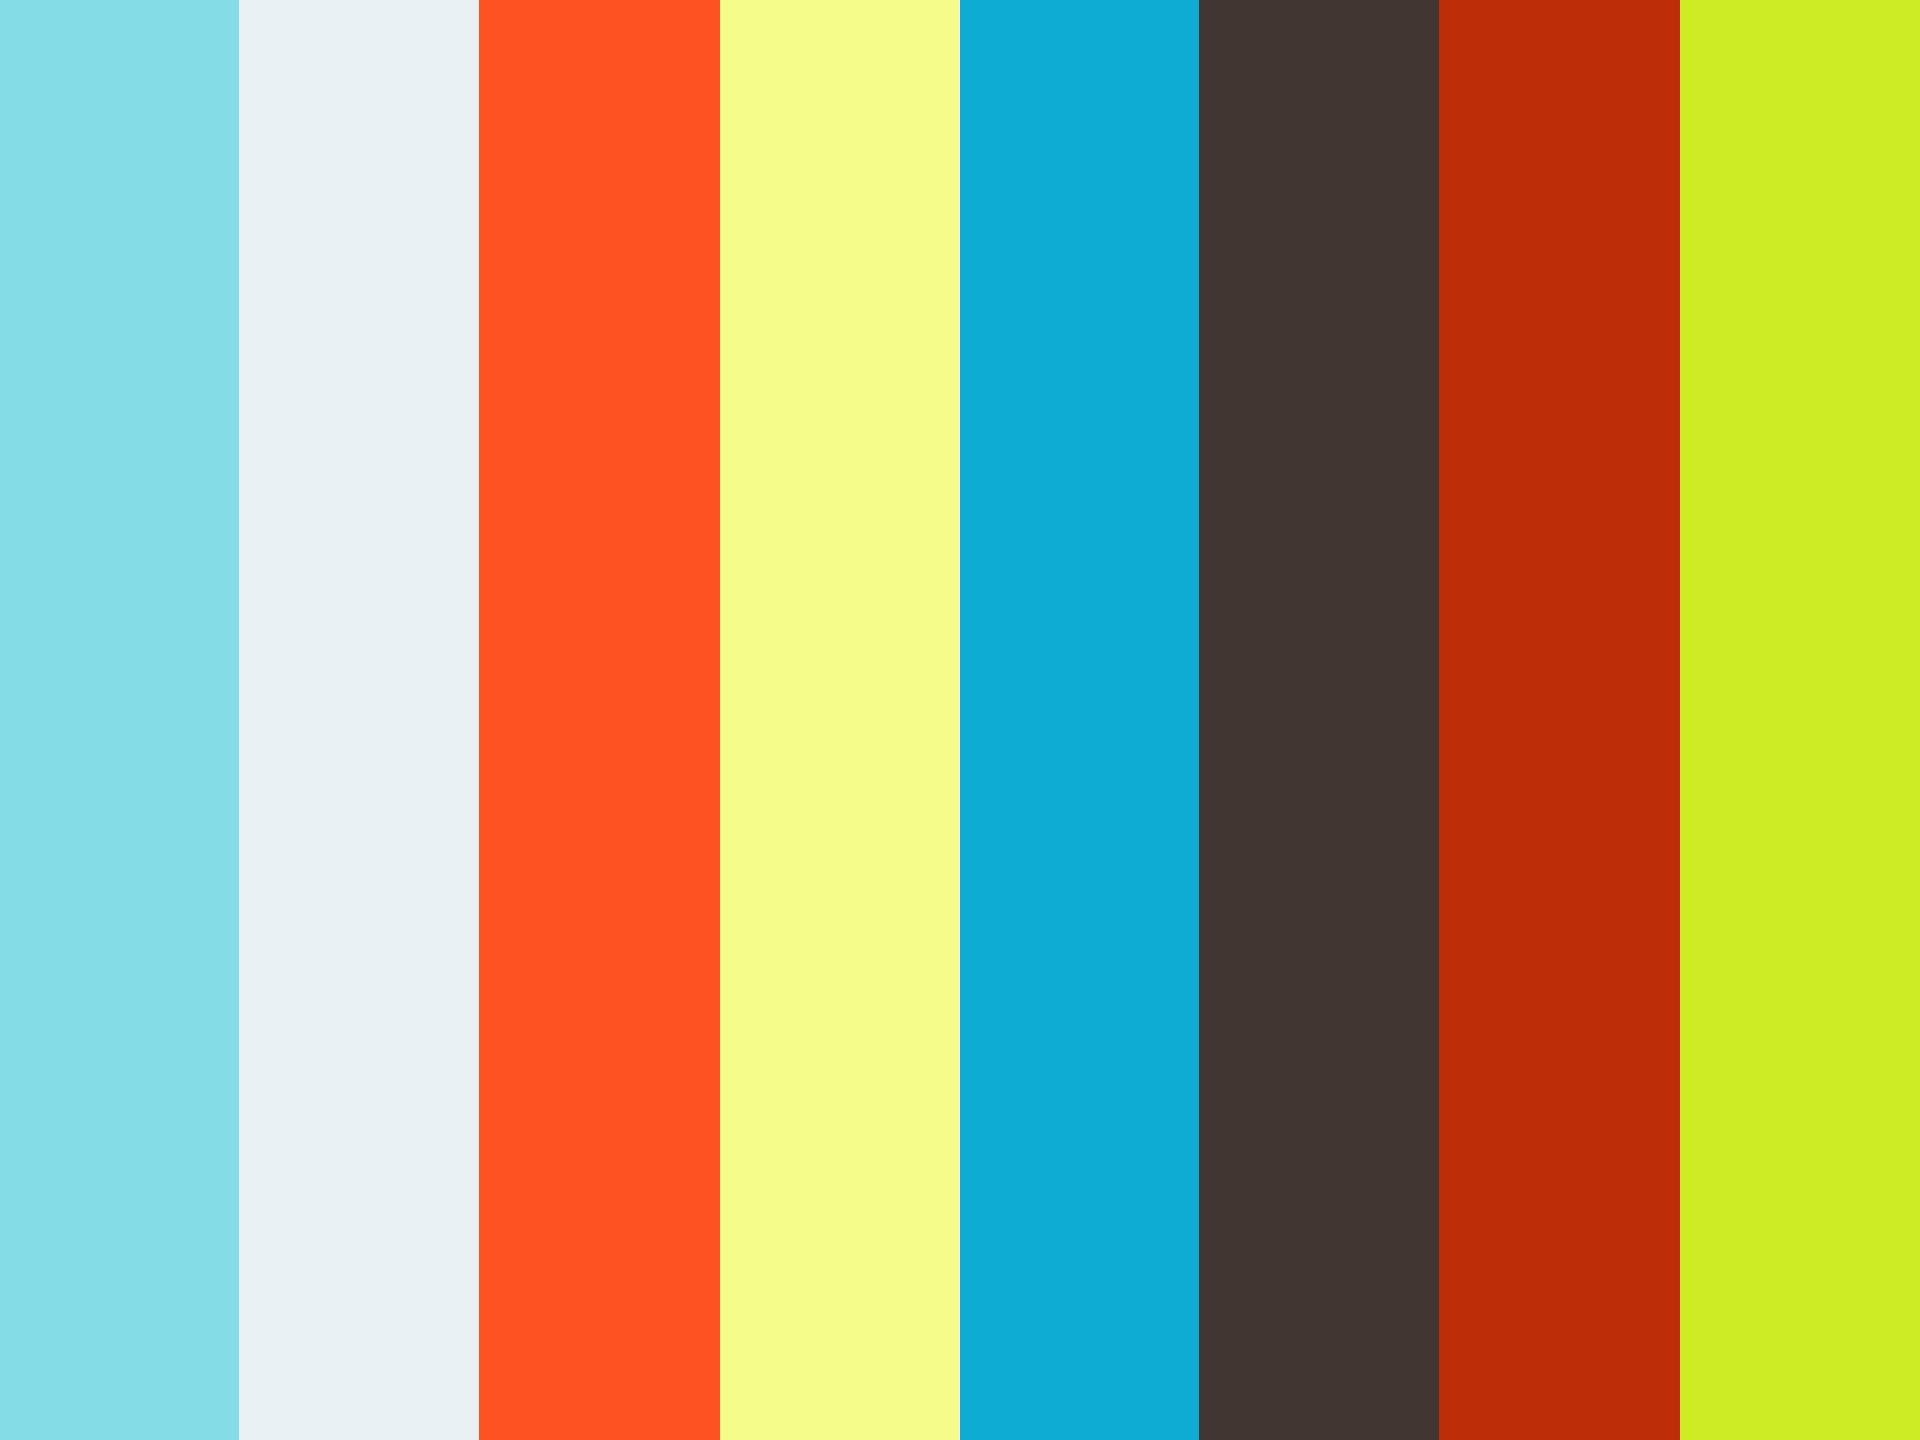 Победа Александра Поветкина над Карлосом Такама Alexander Povetkin vs Carlos Takama on Vimeo